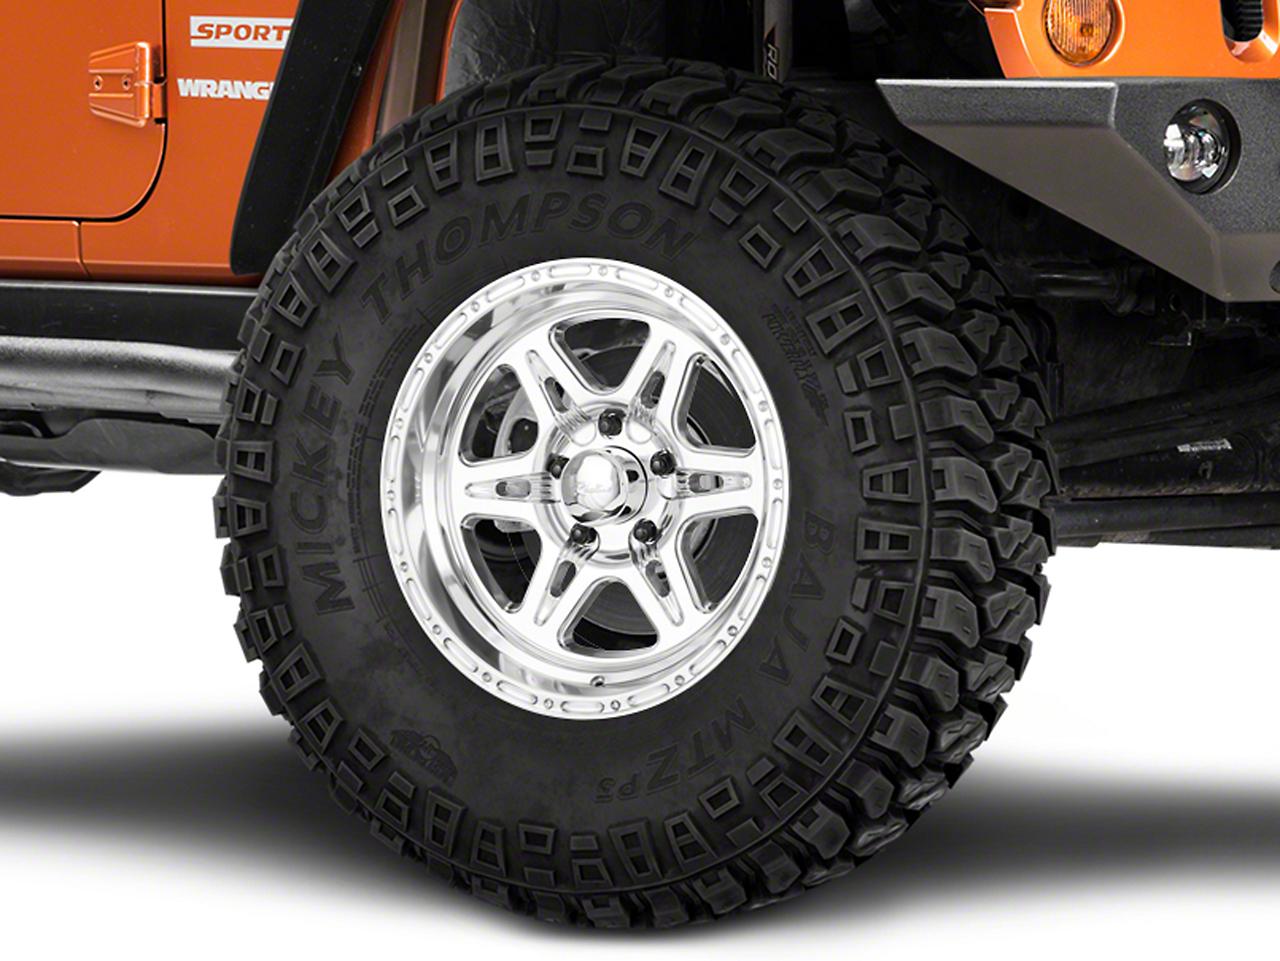 Raceline Renegade Polished Wheel - 17x9 (07-18 Jeep Wrangler JK; 2018 Jeep Wrangler JL)